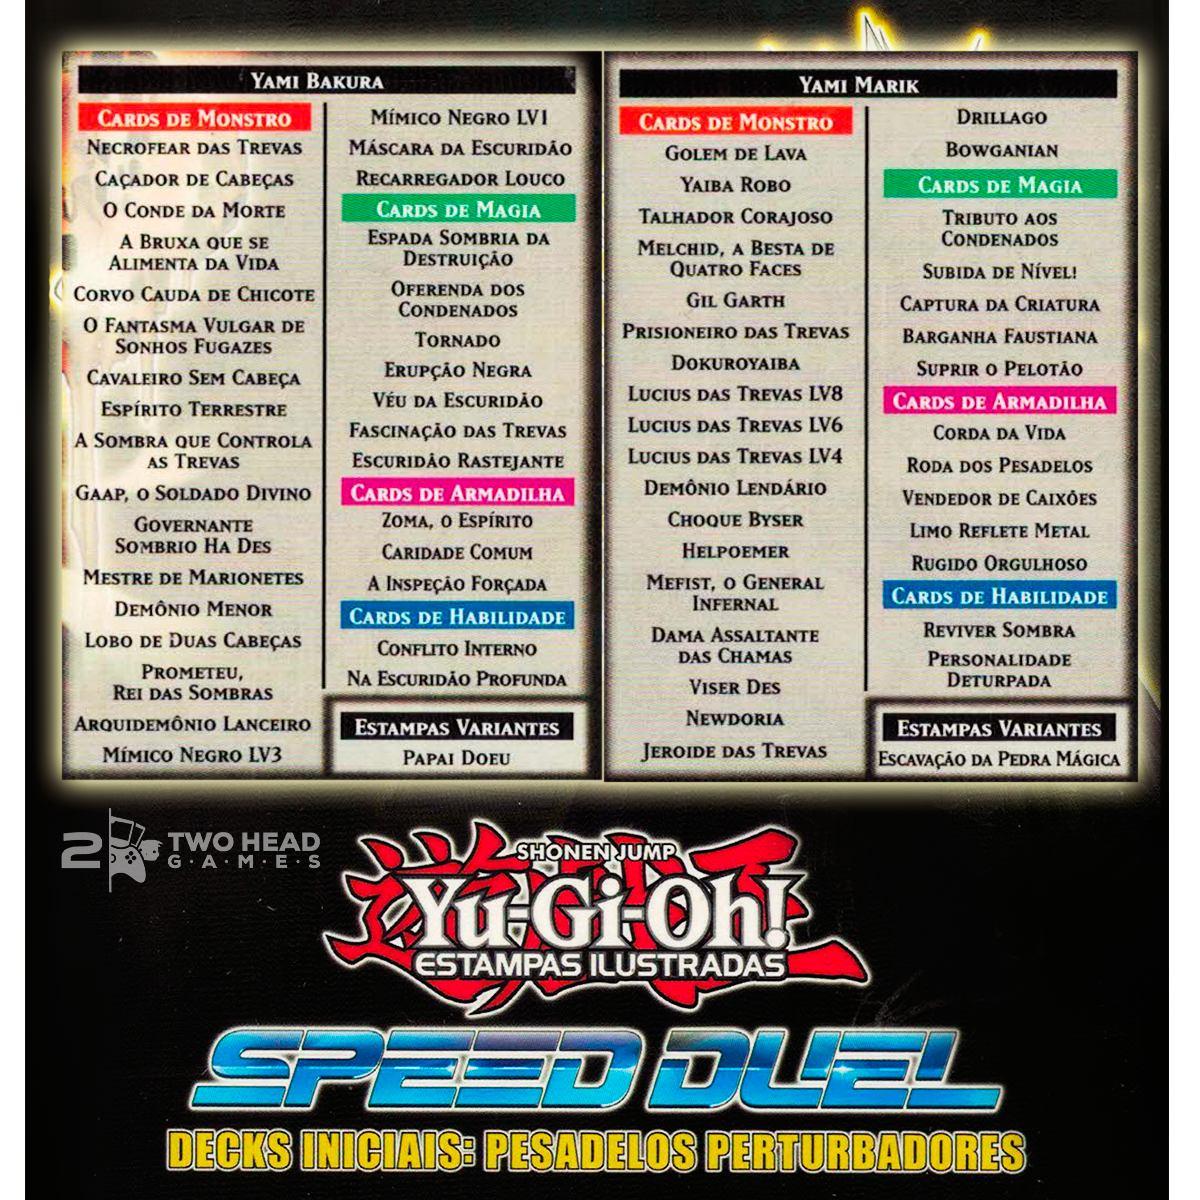 Yugioh Deck Inicial Marik E Bakura Pesadelos Perturbadores Speed Duel